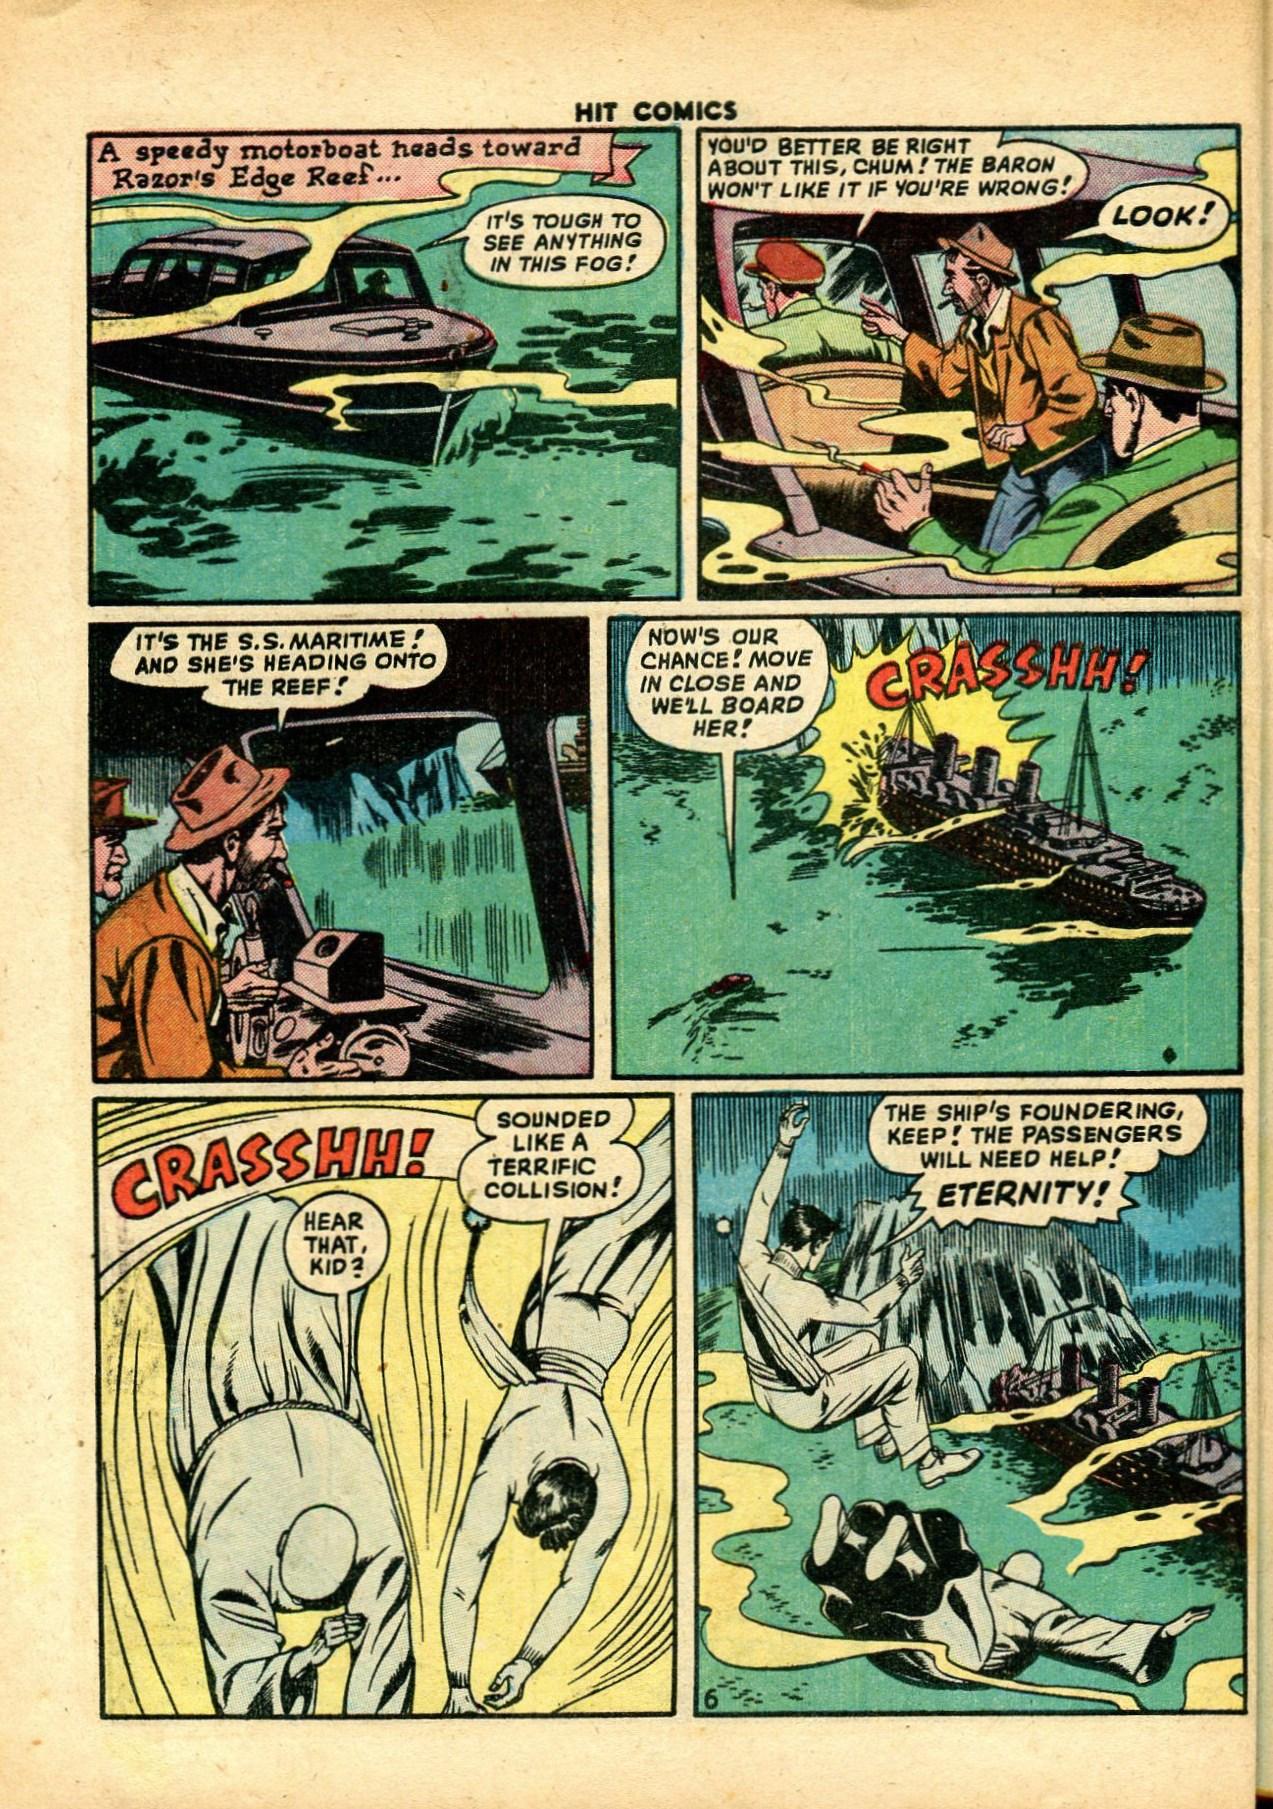 Read online Hit Comics comic -  Issue #59 - 8